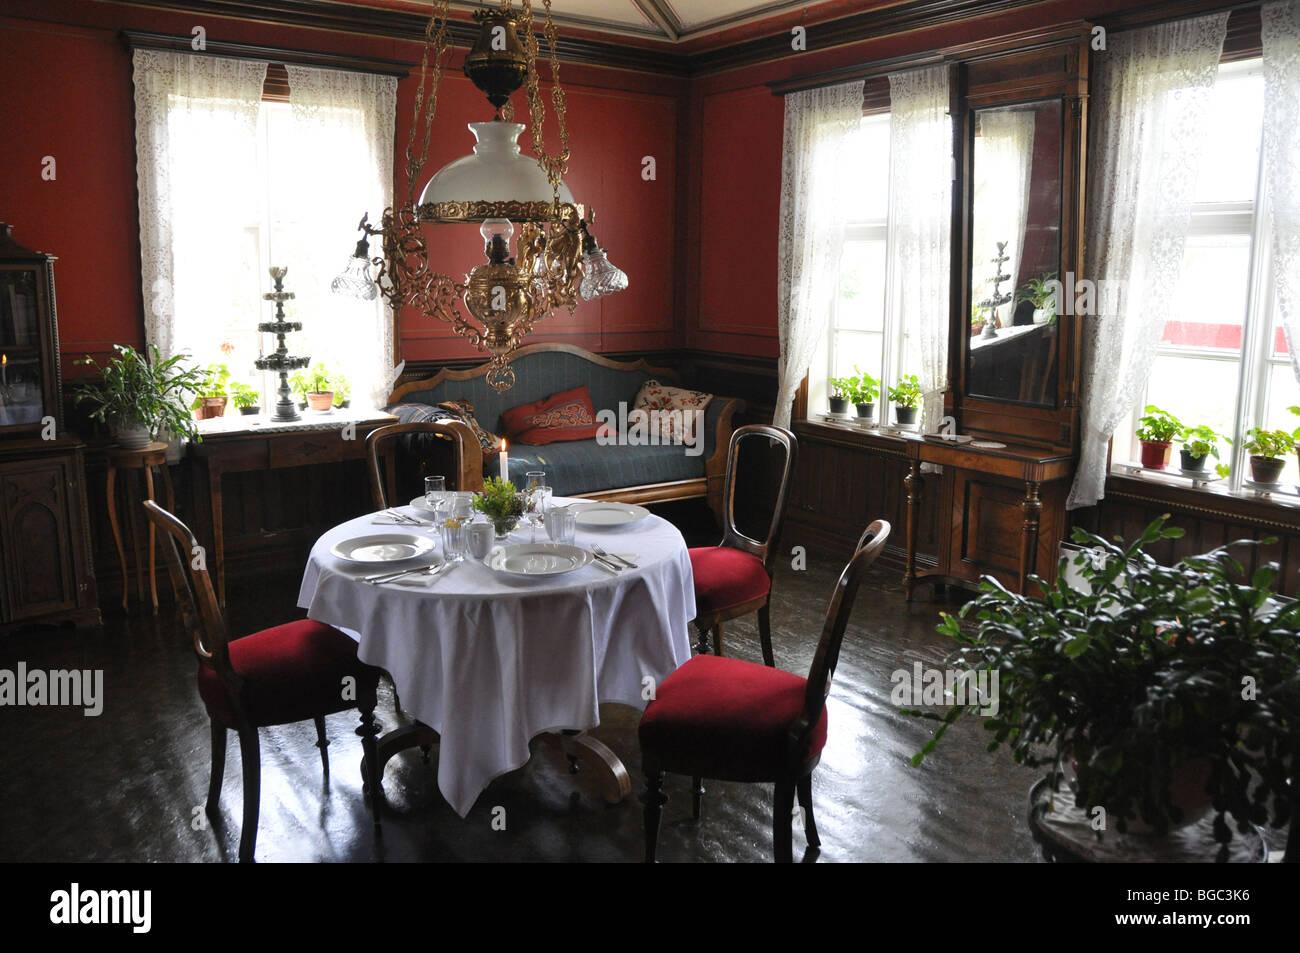 Oppeid,  Dining Room -Haramoy Bygdetun (Village Museum) Norland Norway - Stock Image